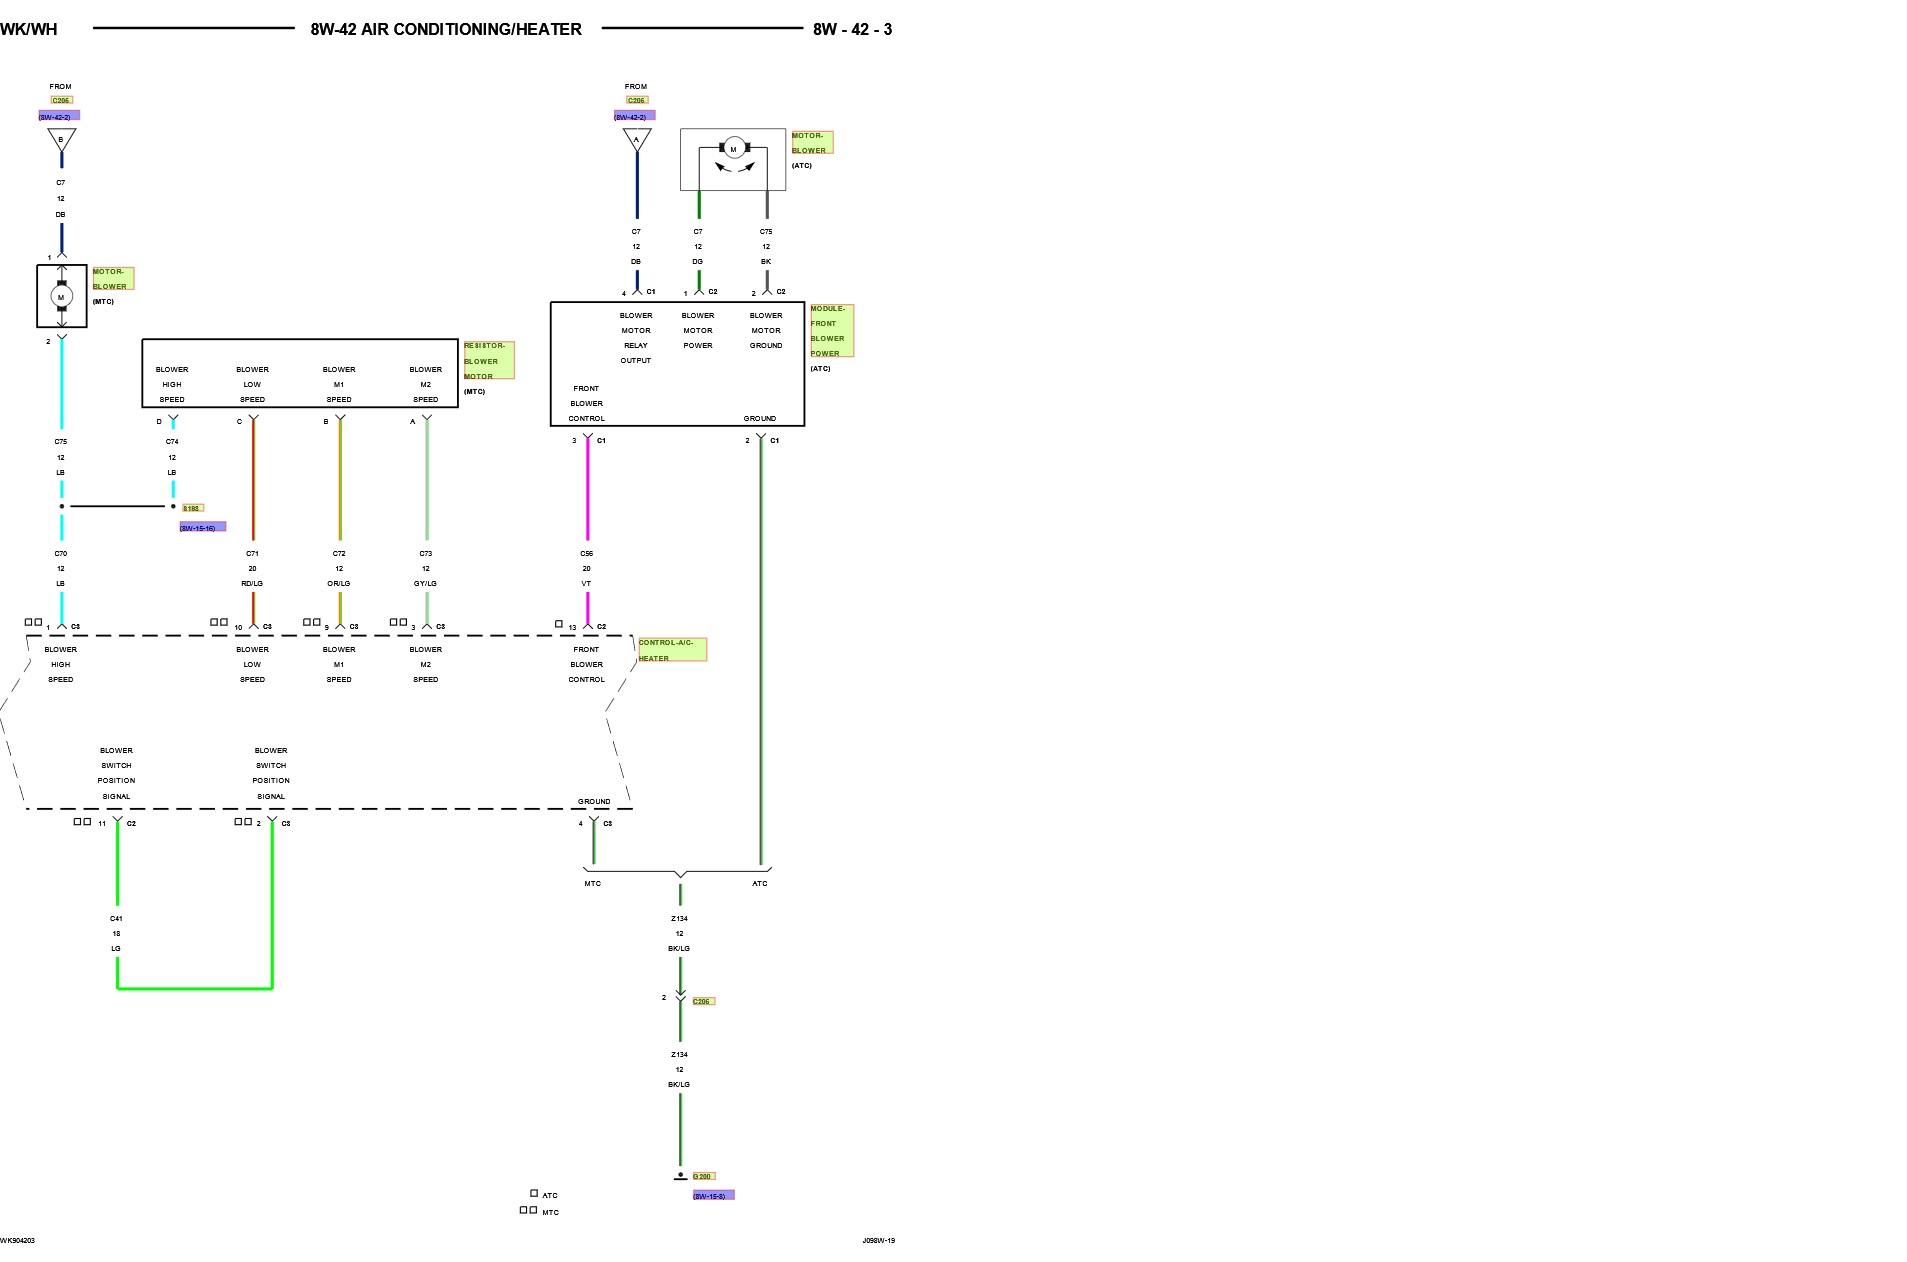 64668fb9-2d15-438d-ba10-3ecc9e89bb9b_ATC wiring.jpg